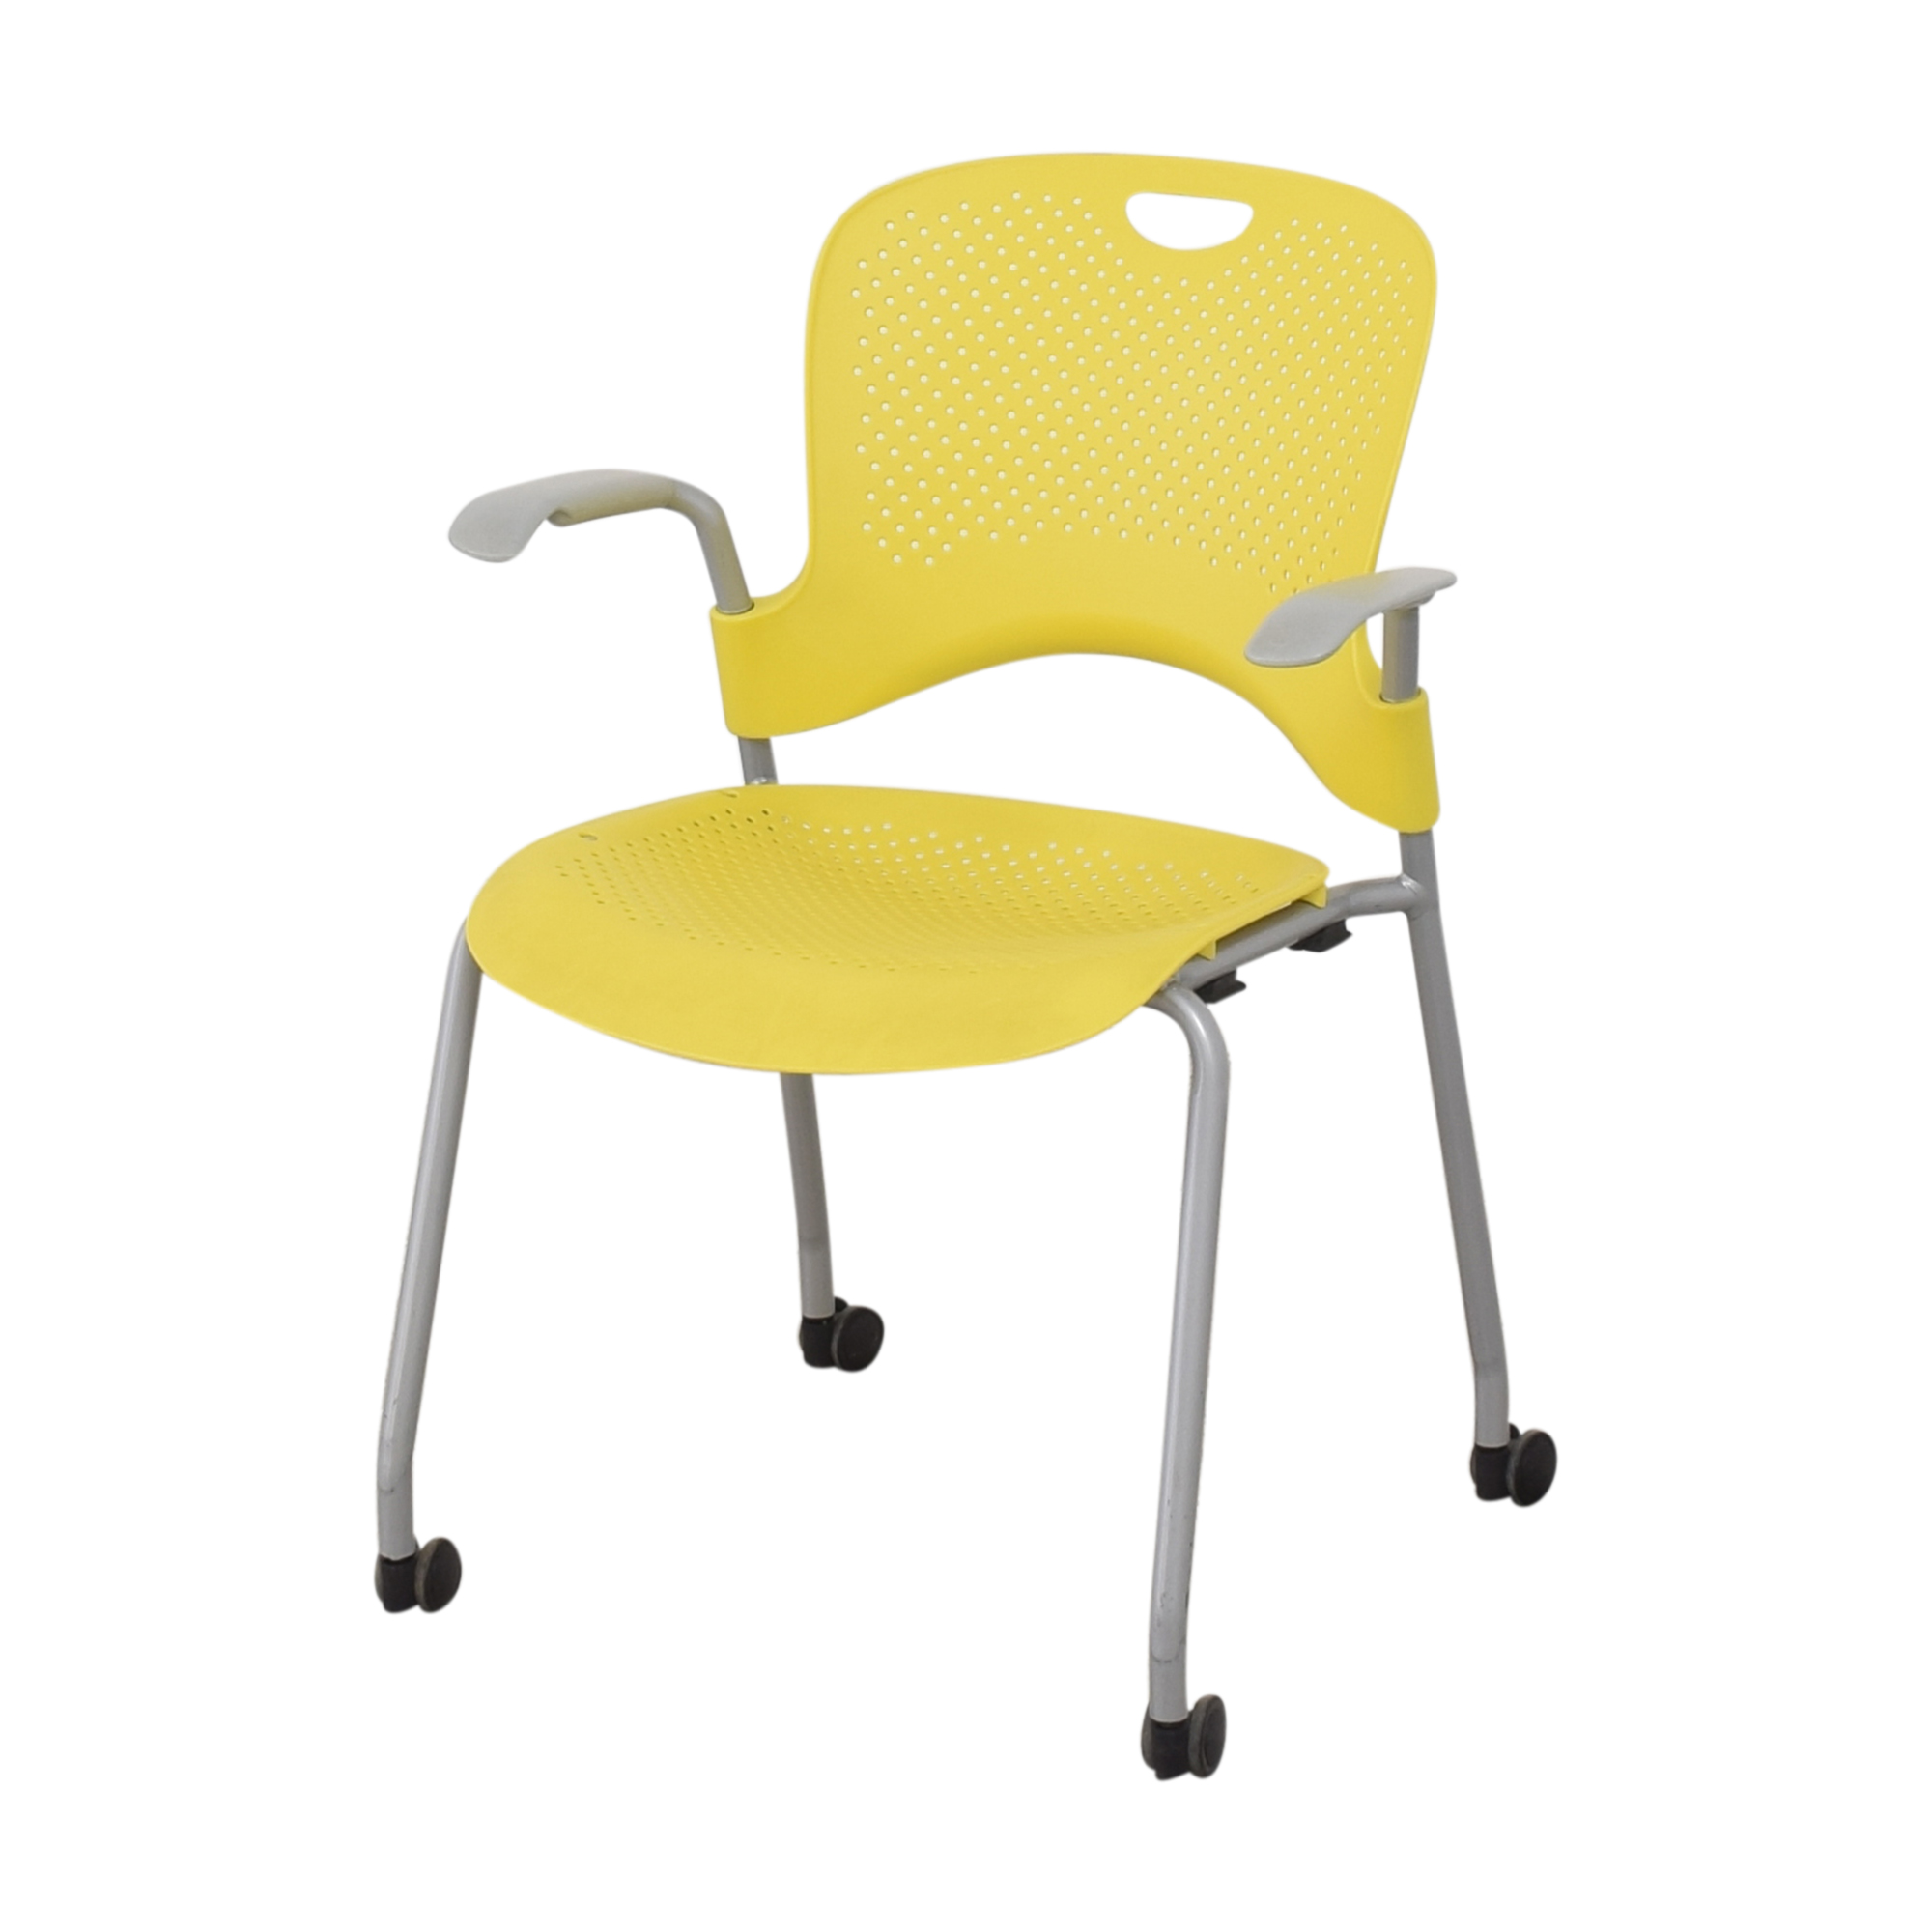 Herman Miller Herman Miller Caper Stacking Chair dimensions